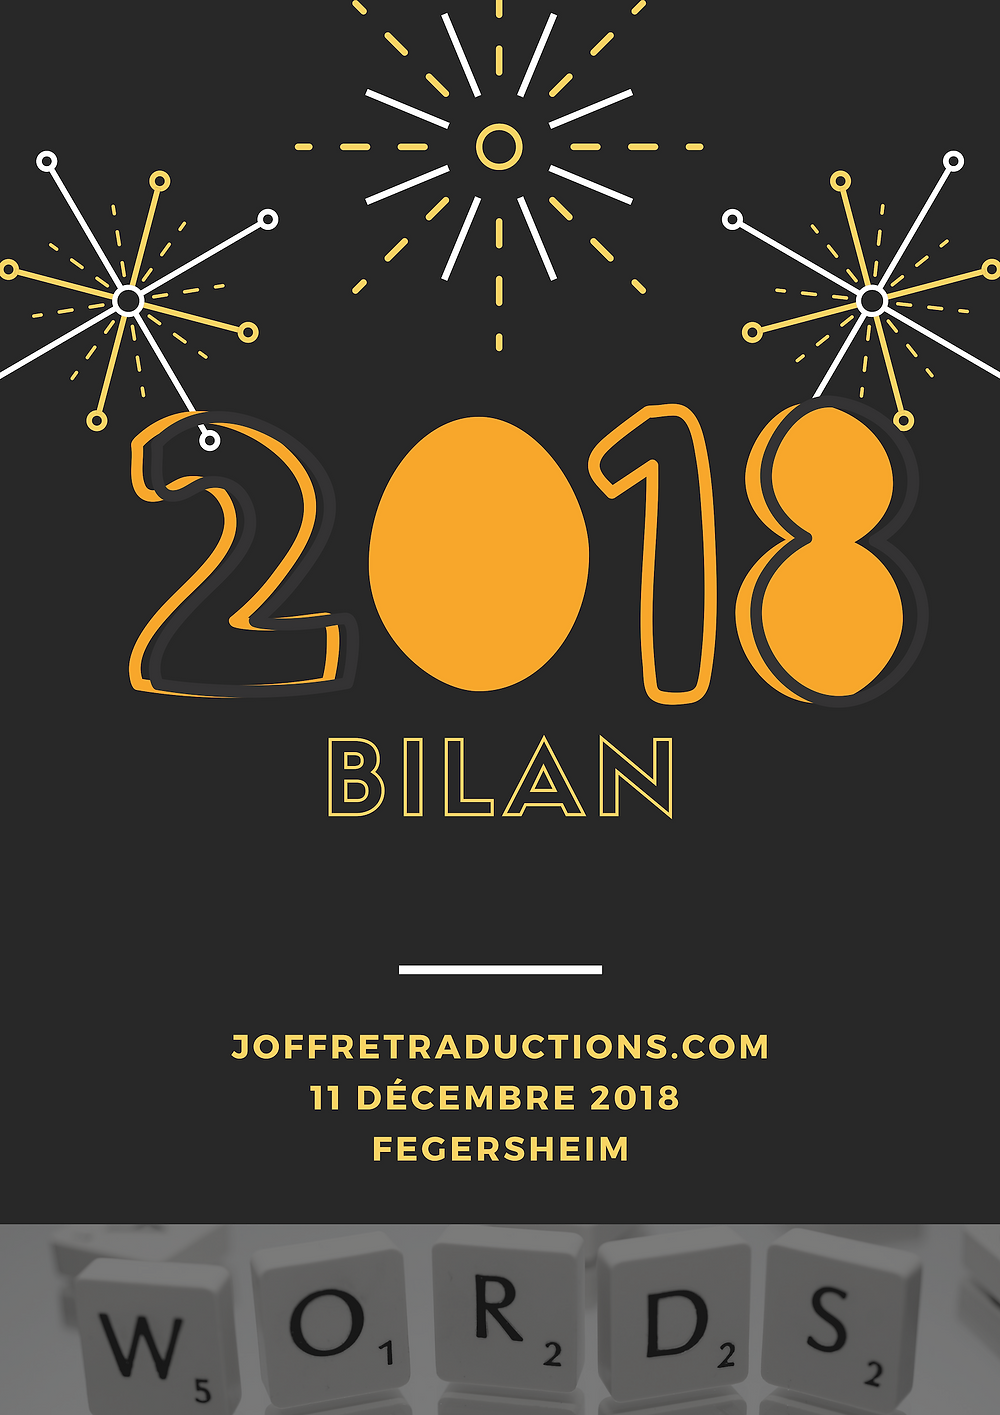 affiche bilan 2018 Joffre traductions